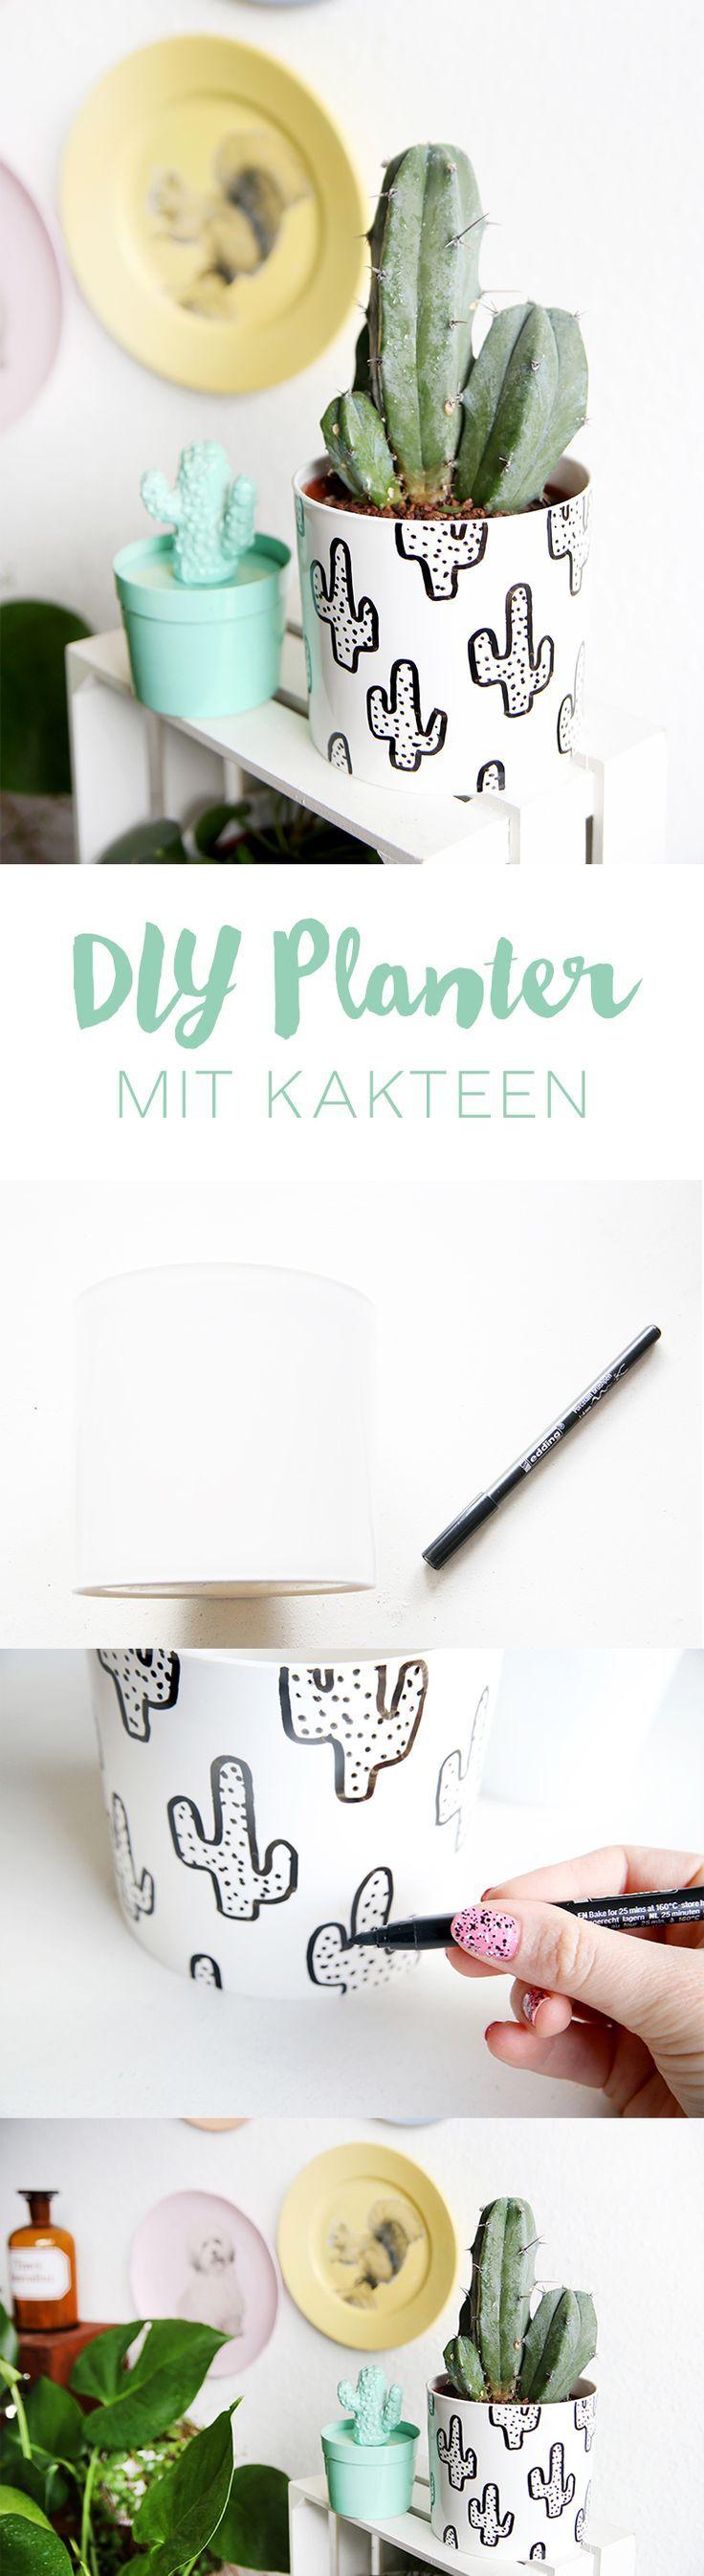 {DIY} Süßer Kakteen-Pflanztopf